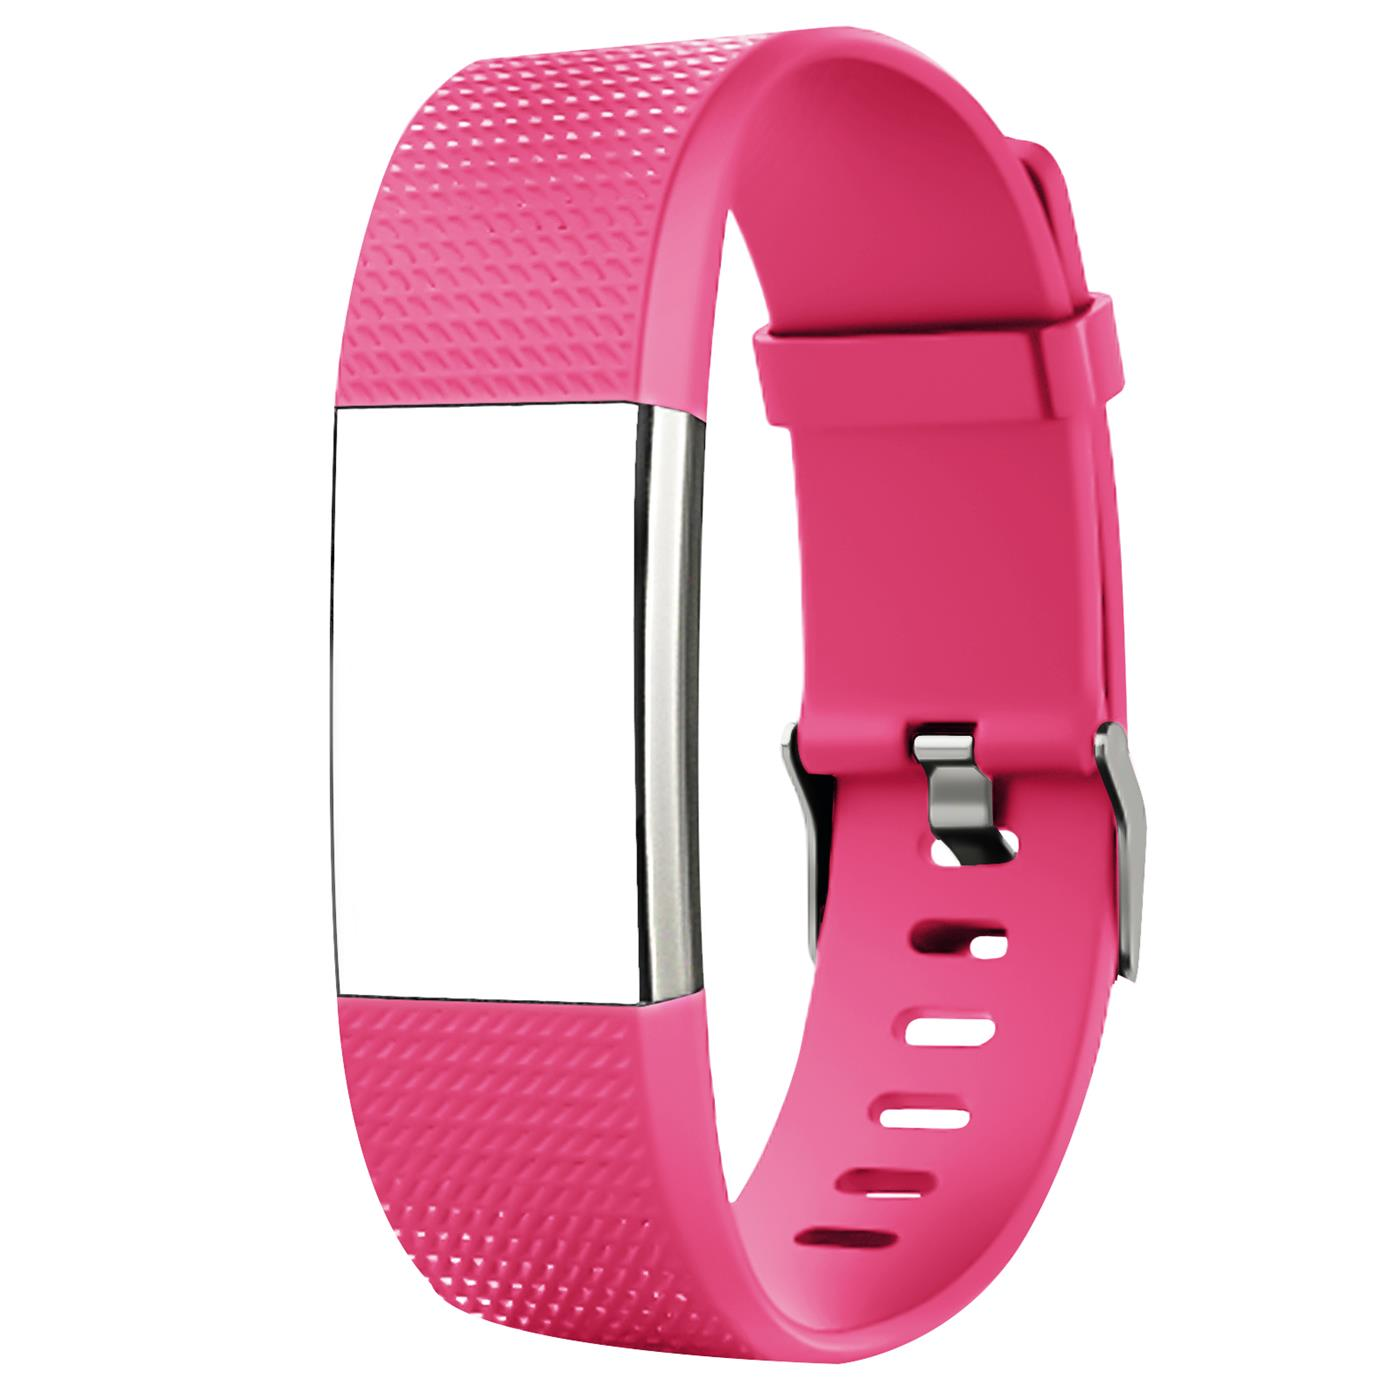 Fitbit-Groesse-S-oder-L-Ersatz-Silikon-Armband-Uhren-Sport-Band-Fitness-Tracker Indexbild 15